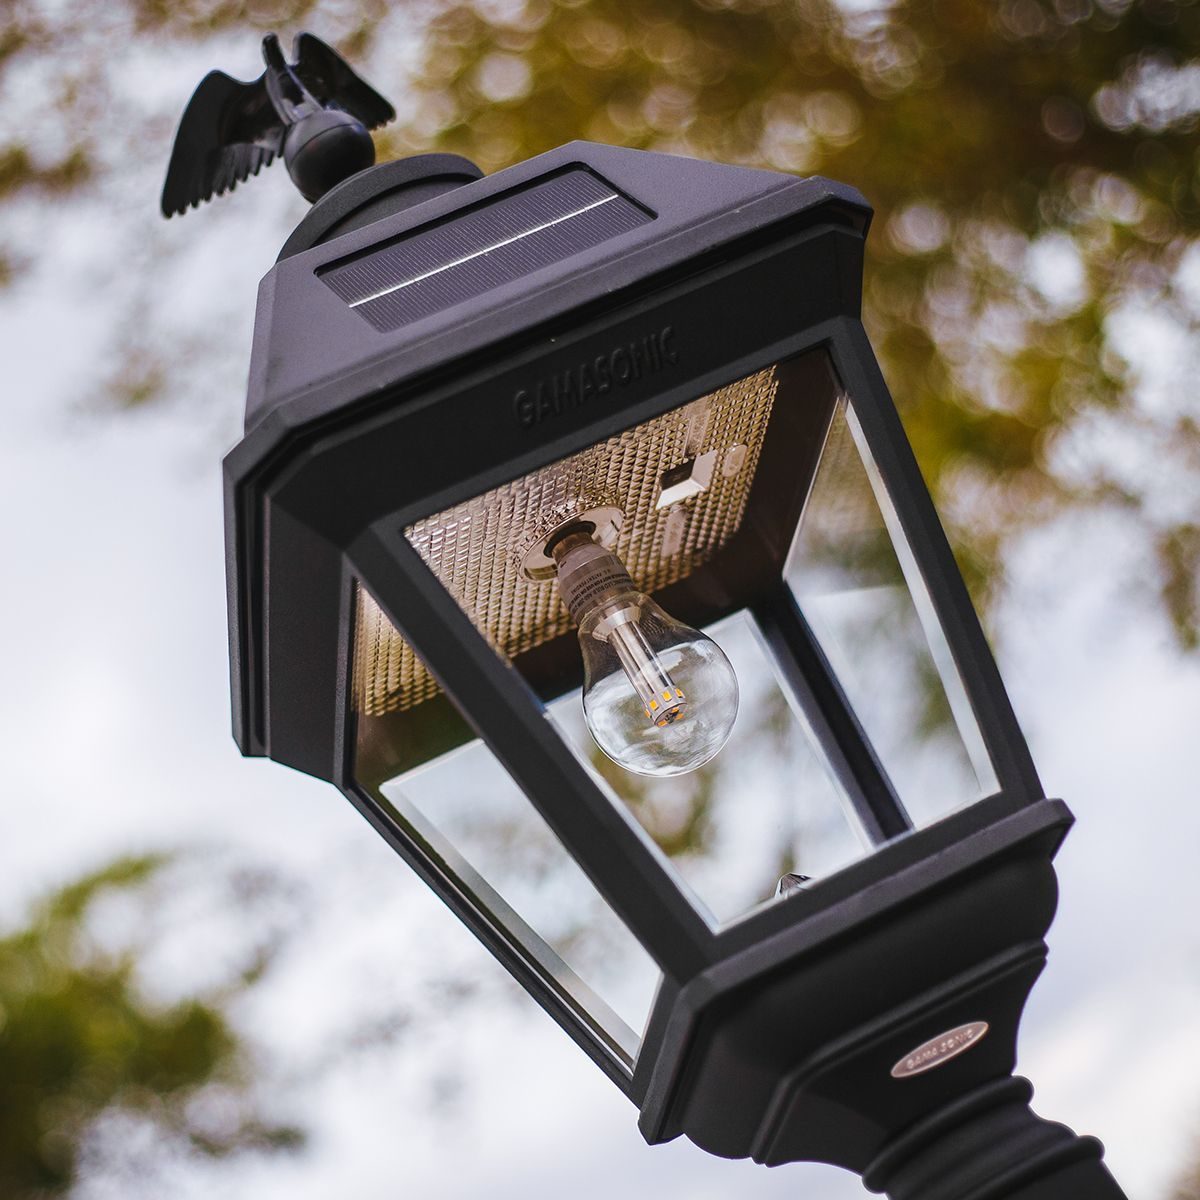 Gama sonic imperial bulb solar post light greenlytes